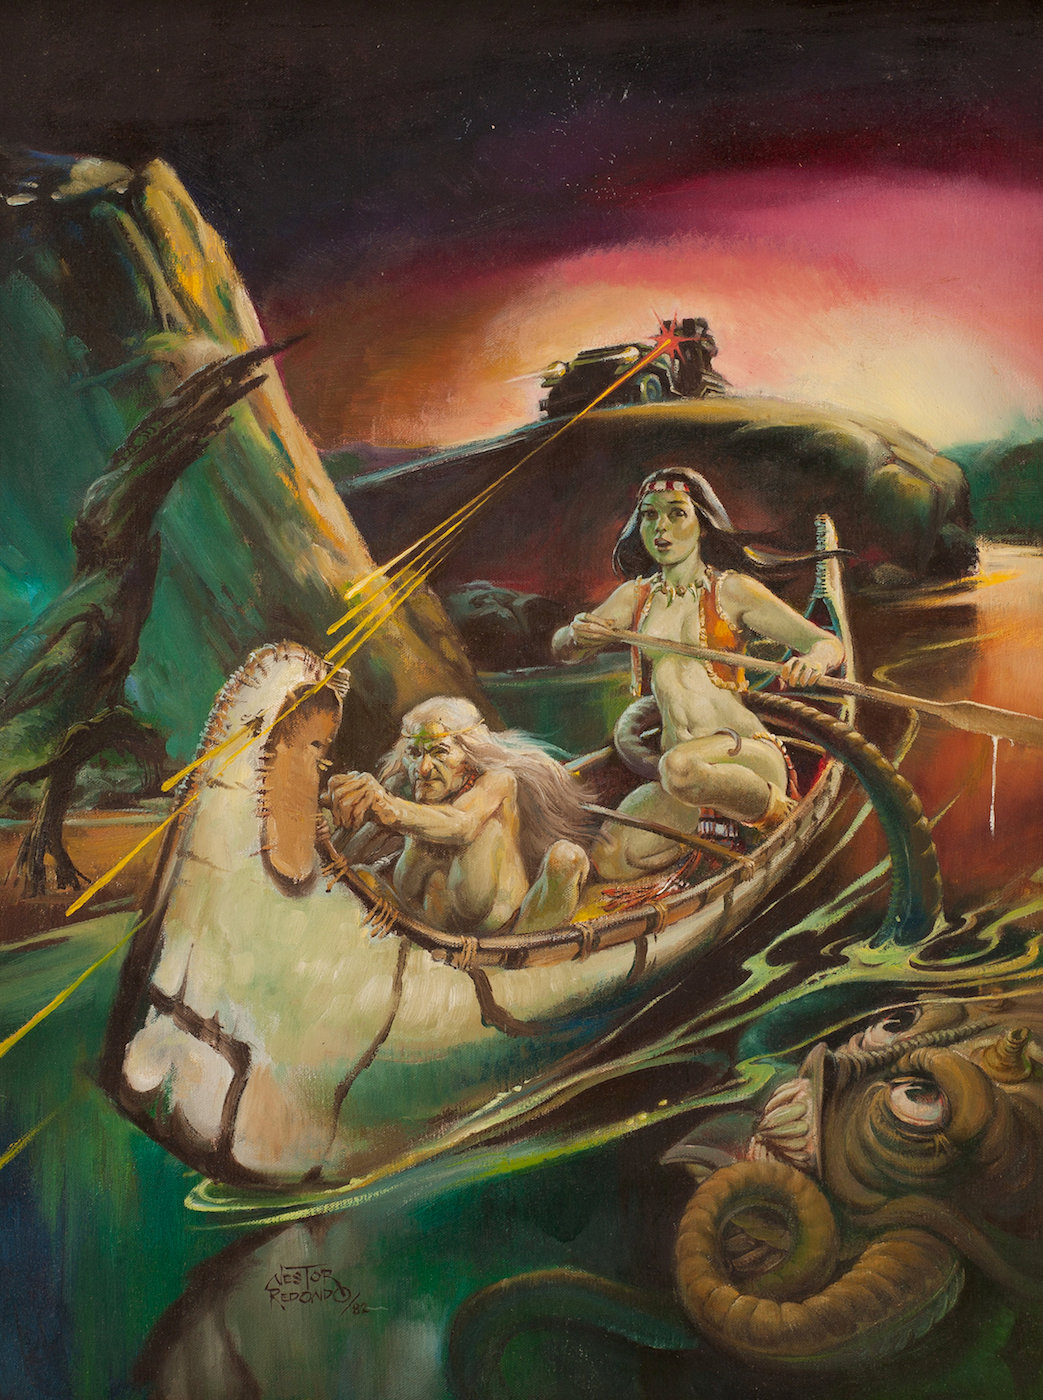 paintedNestor Redondo Painted Fantasy Cover Original Art